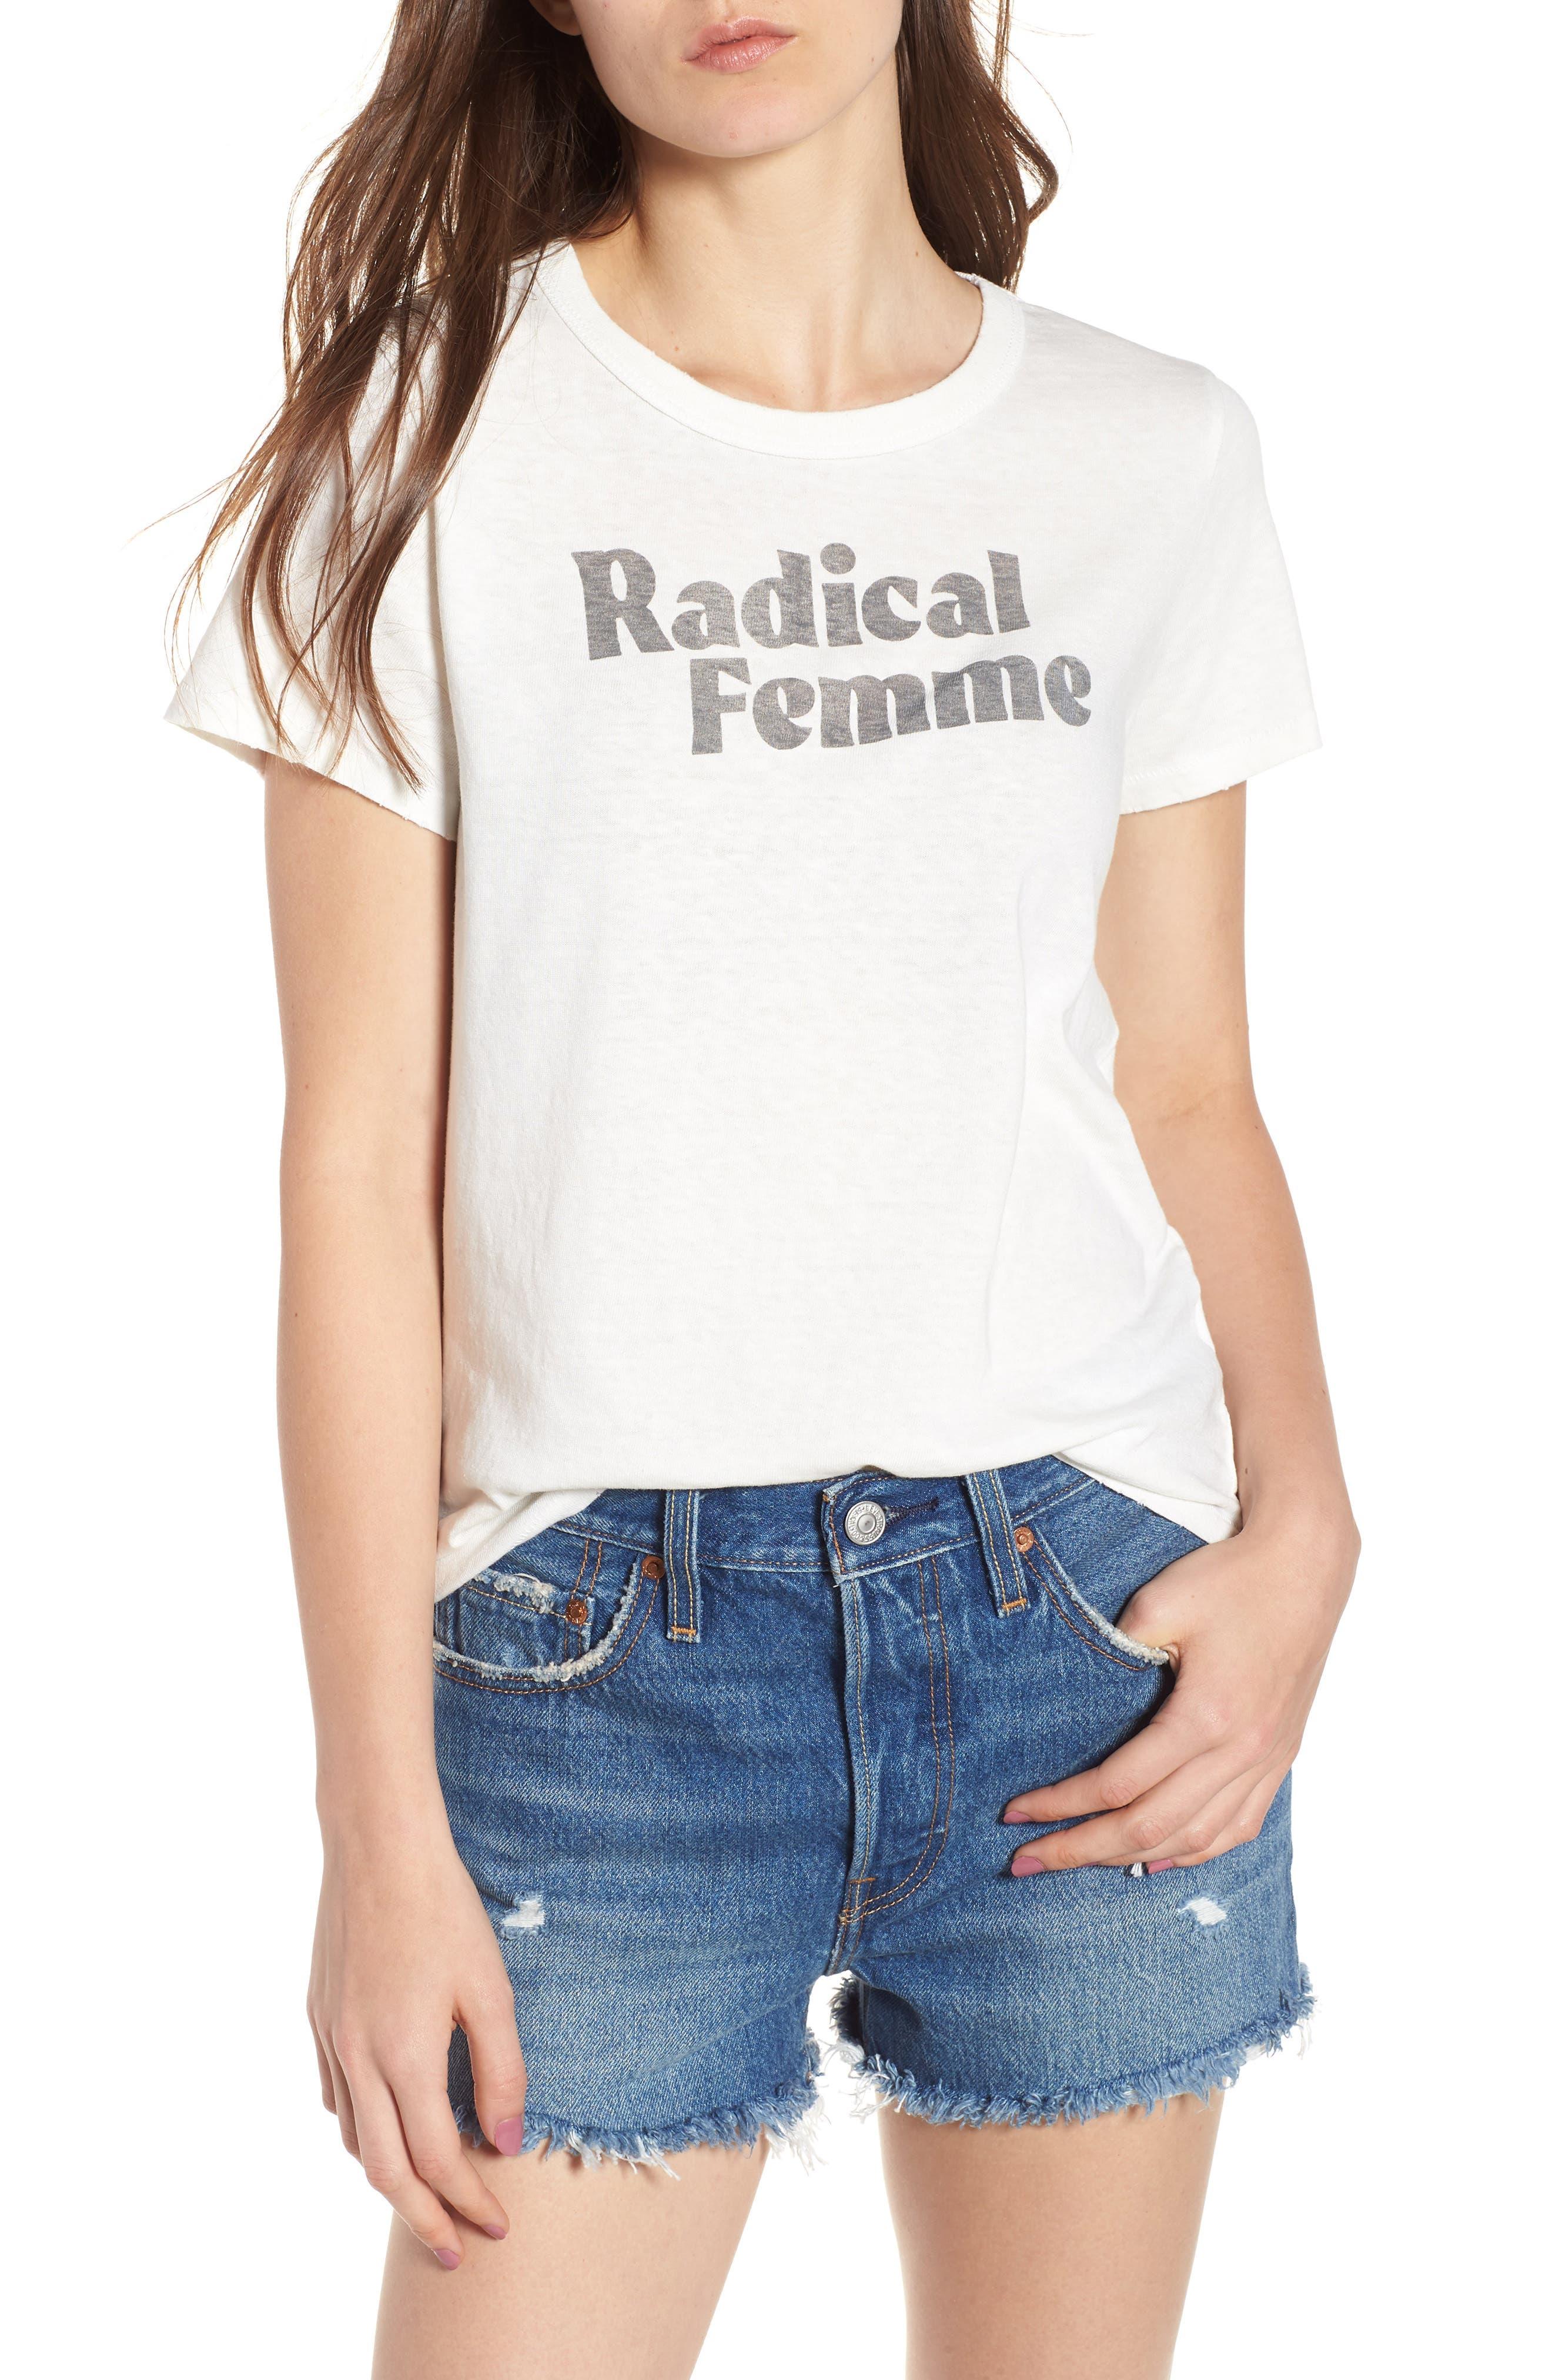 Radical Femme Tee,                         Main,                         color, Vintage White